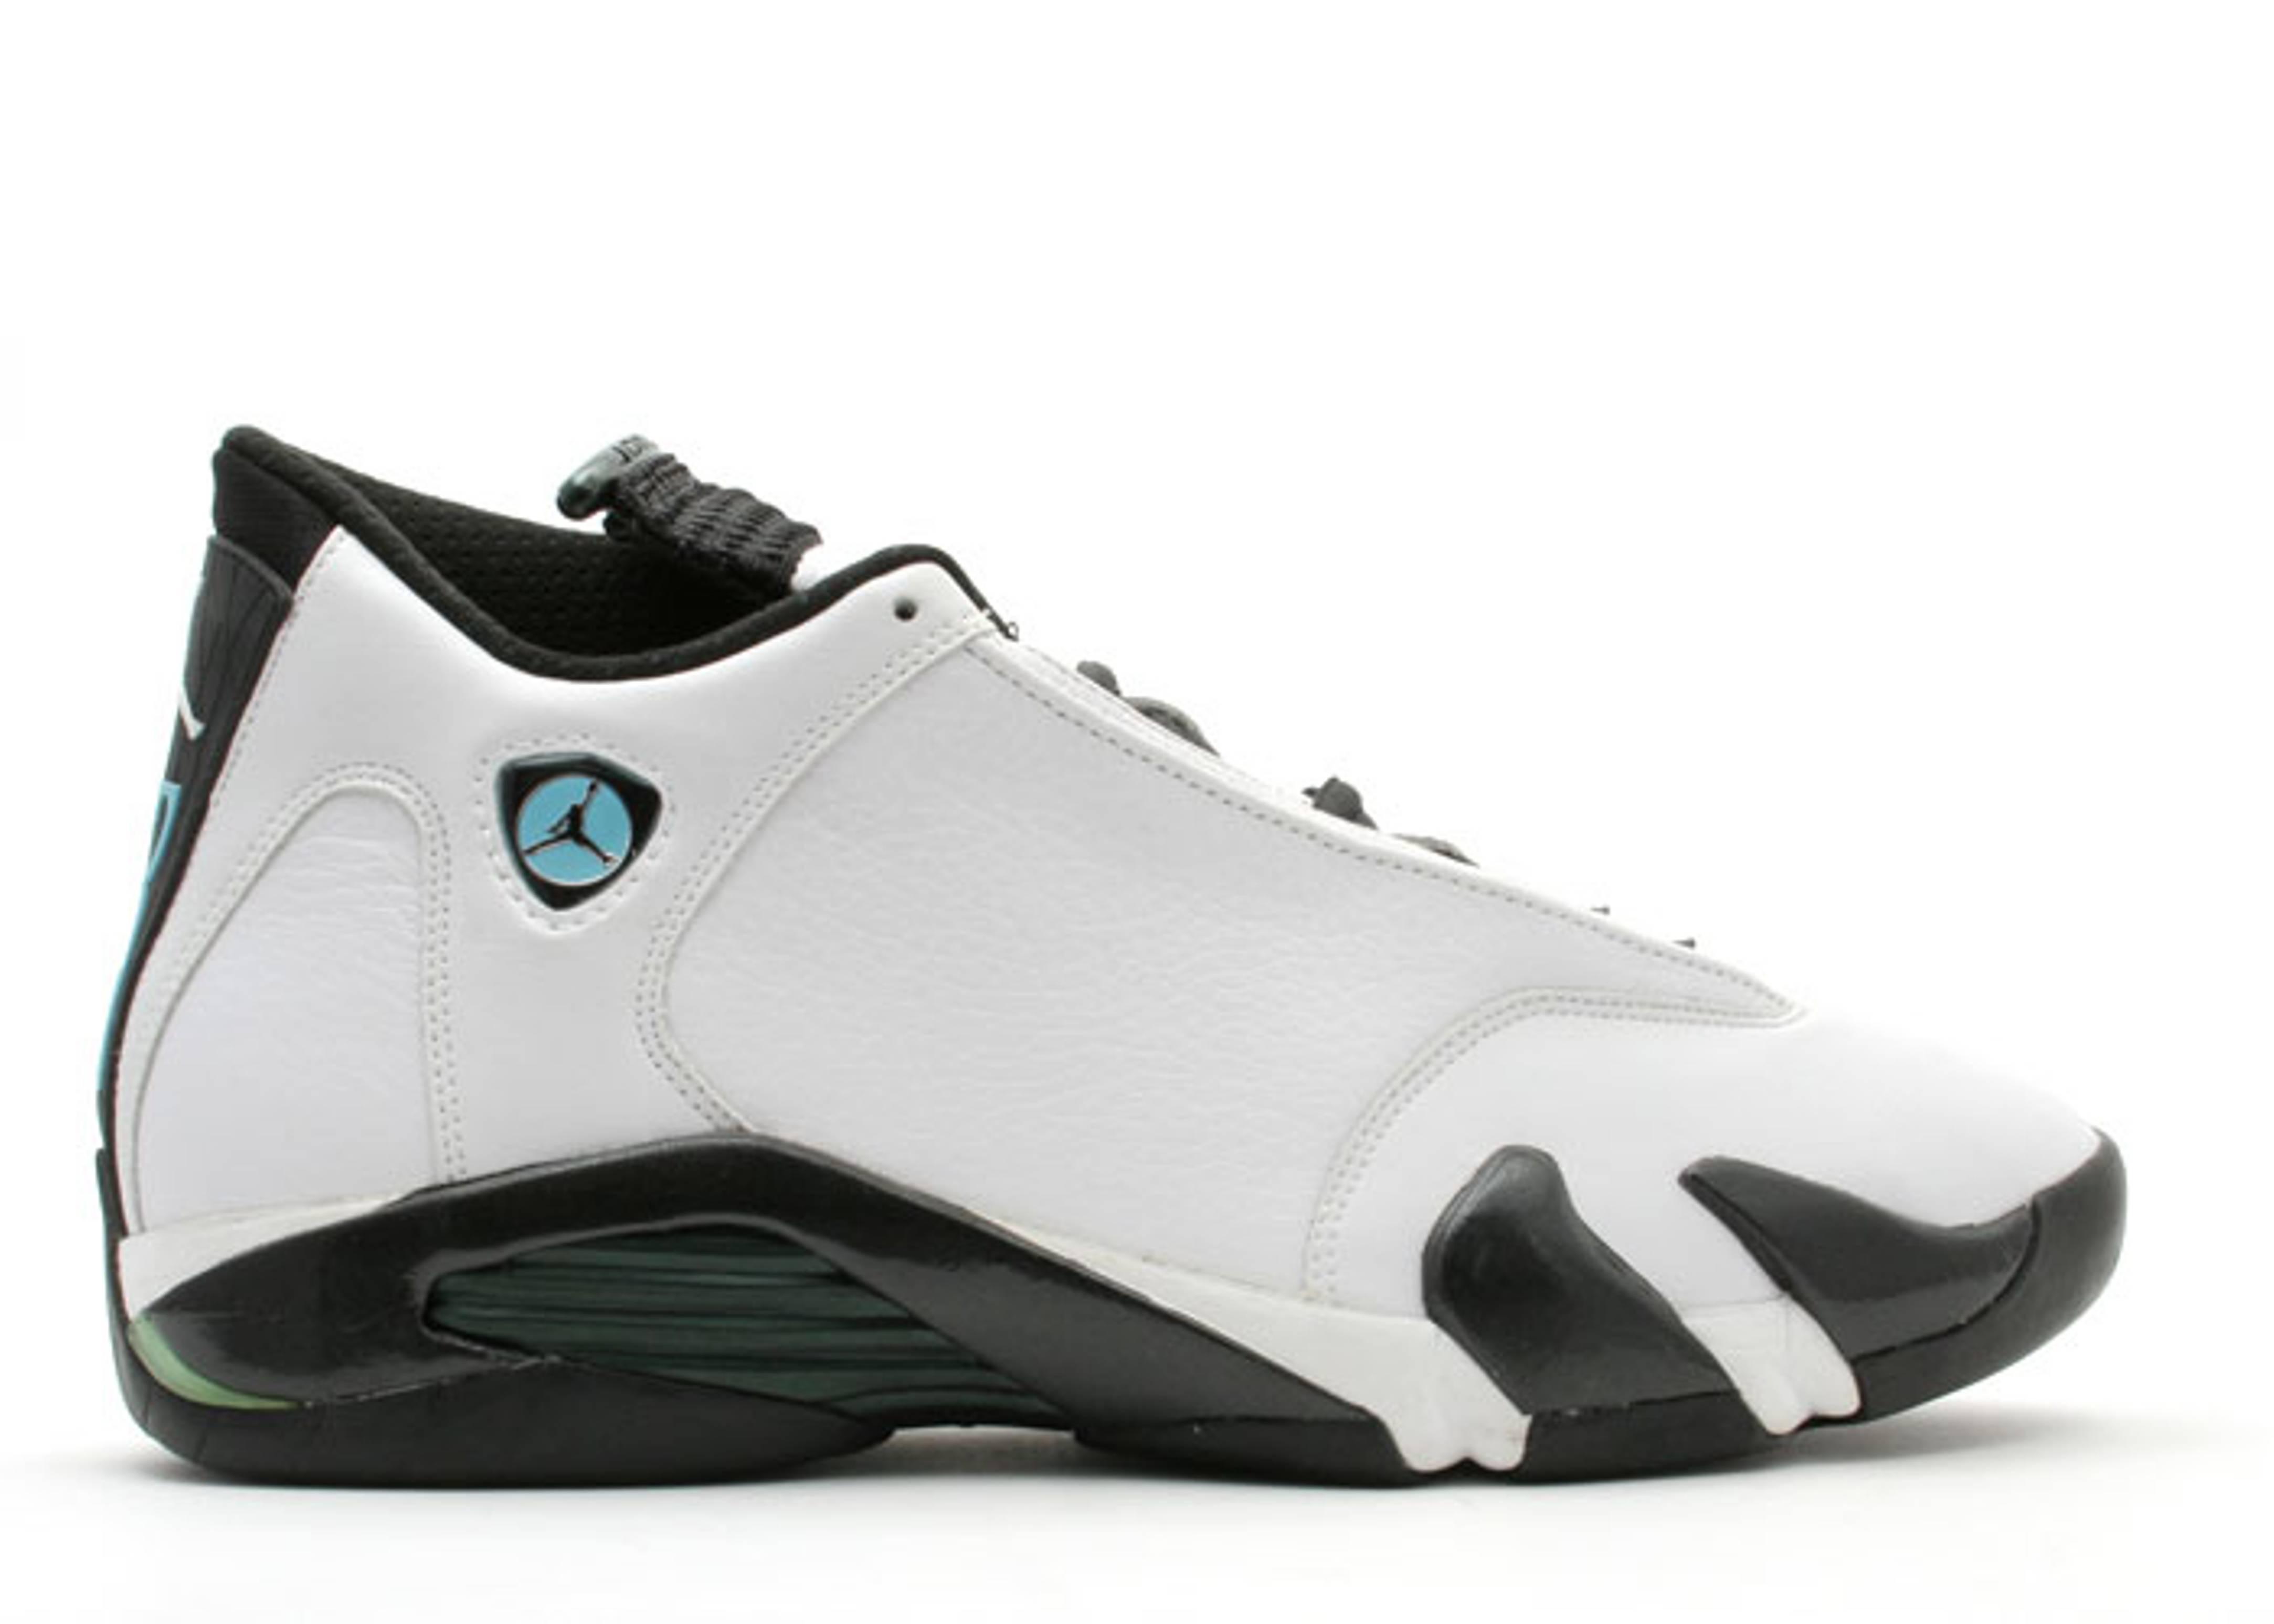 separation shoes fe7da 4047c Air Jordan 14 - Air Jordan - 136011 103 - white black-oxide green ...